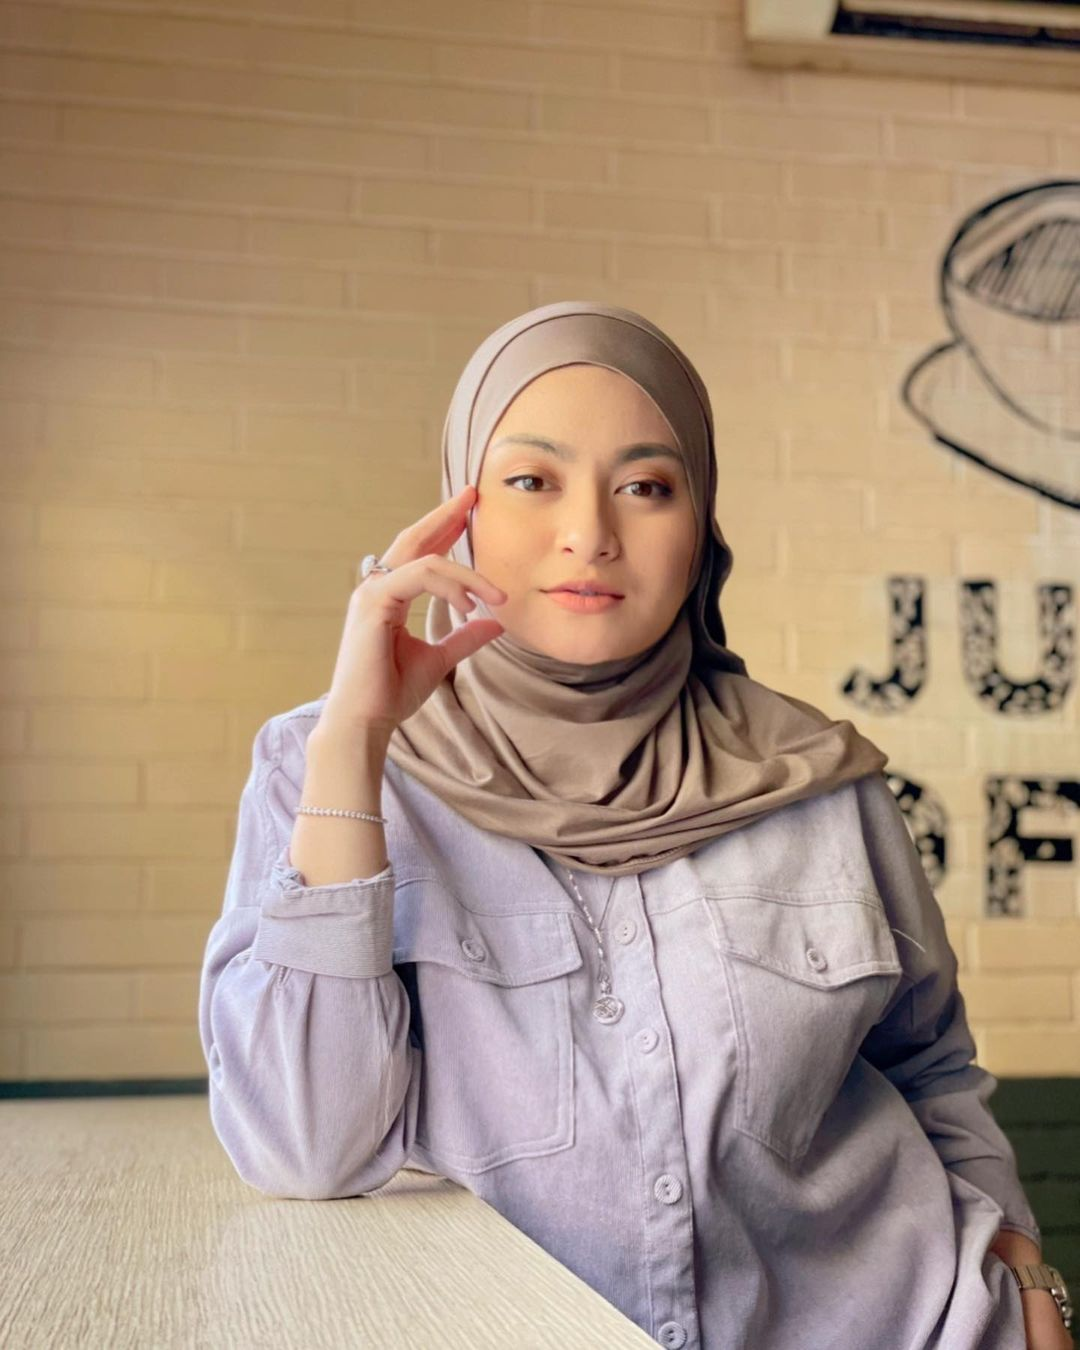 10 Selebriti yang Memutuskan Mualaf, Salah Satunya Istri Arya Saloka